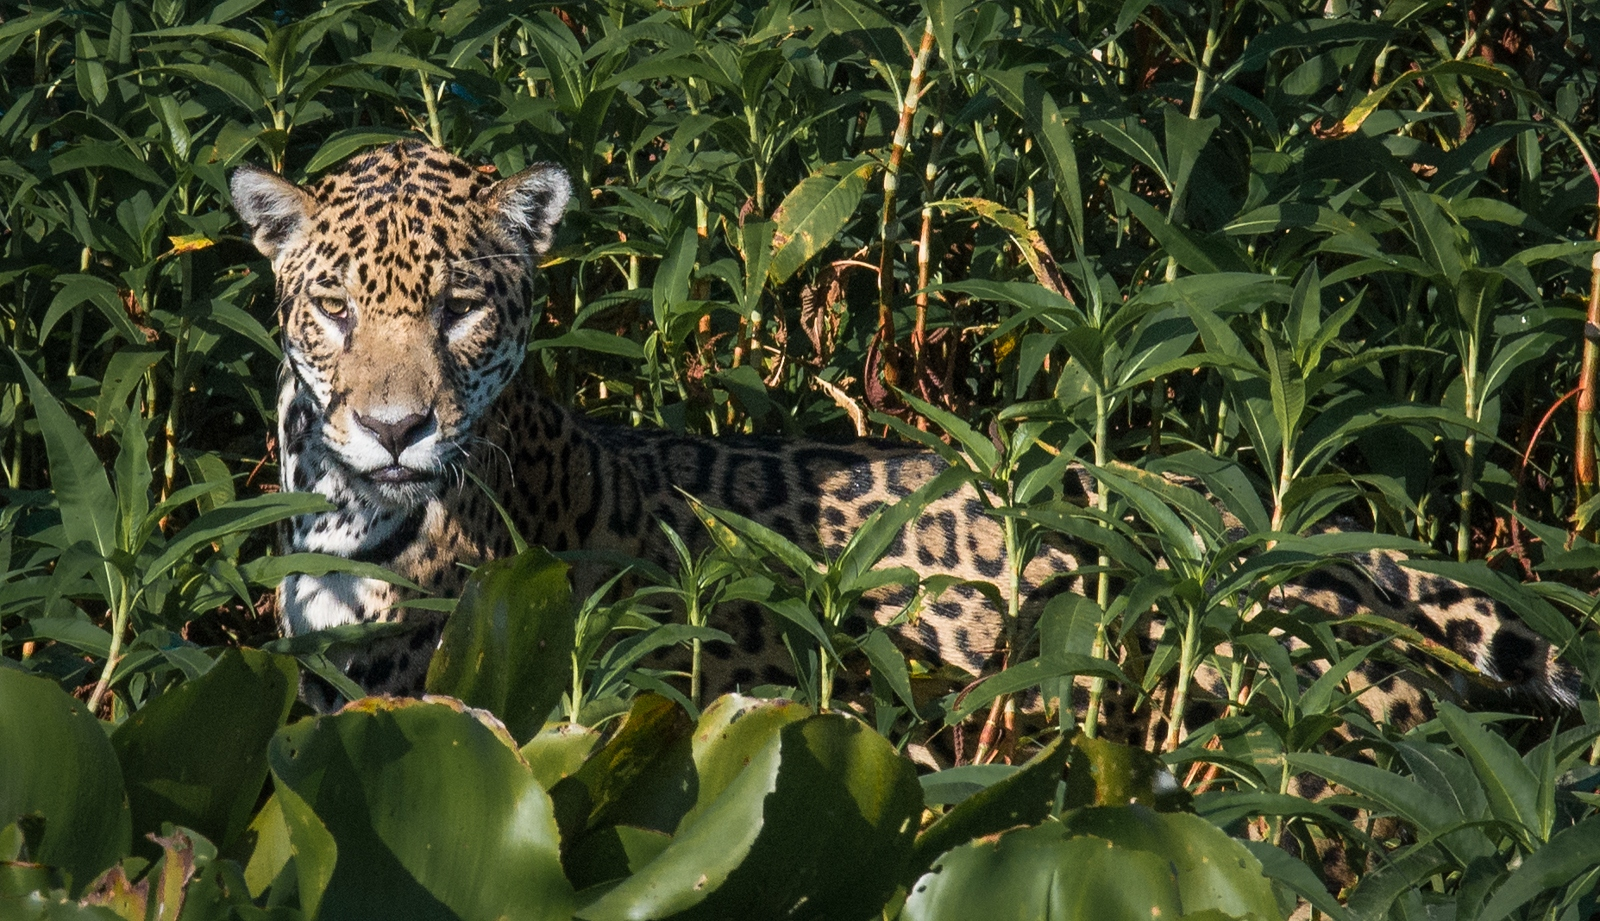 170-Jaguar